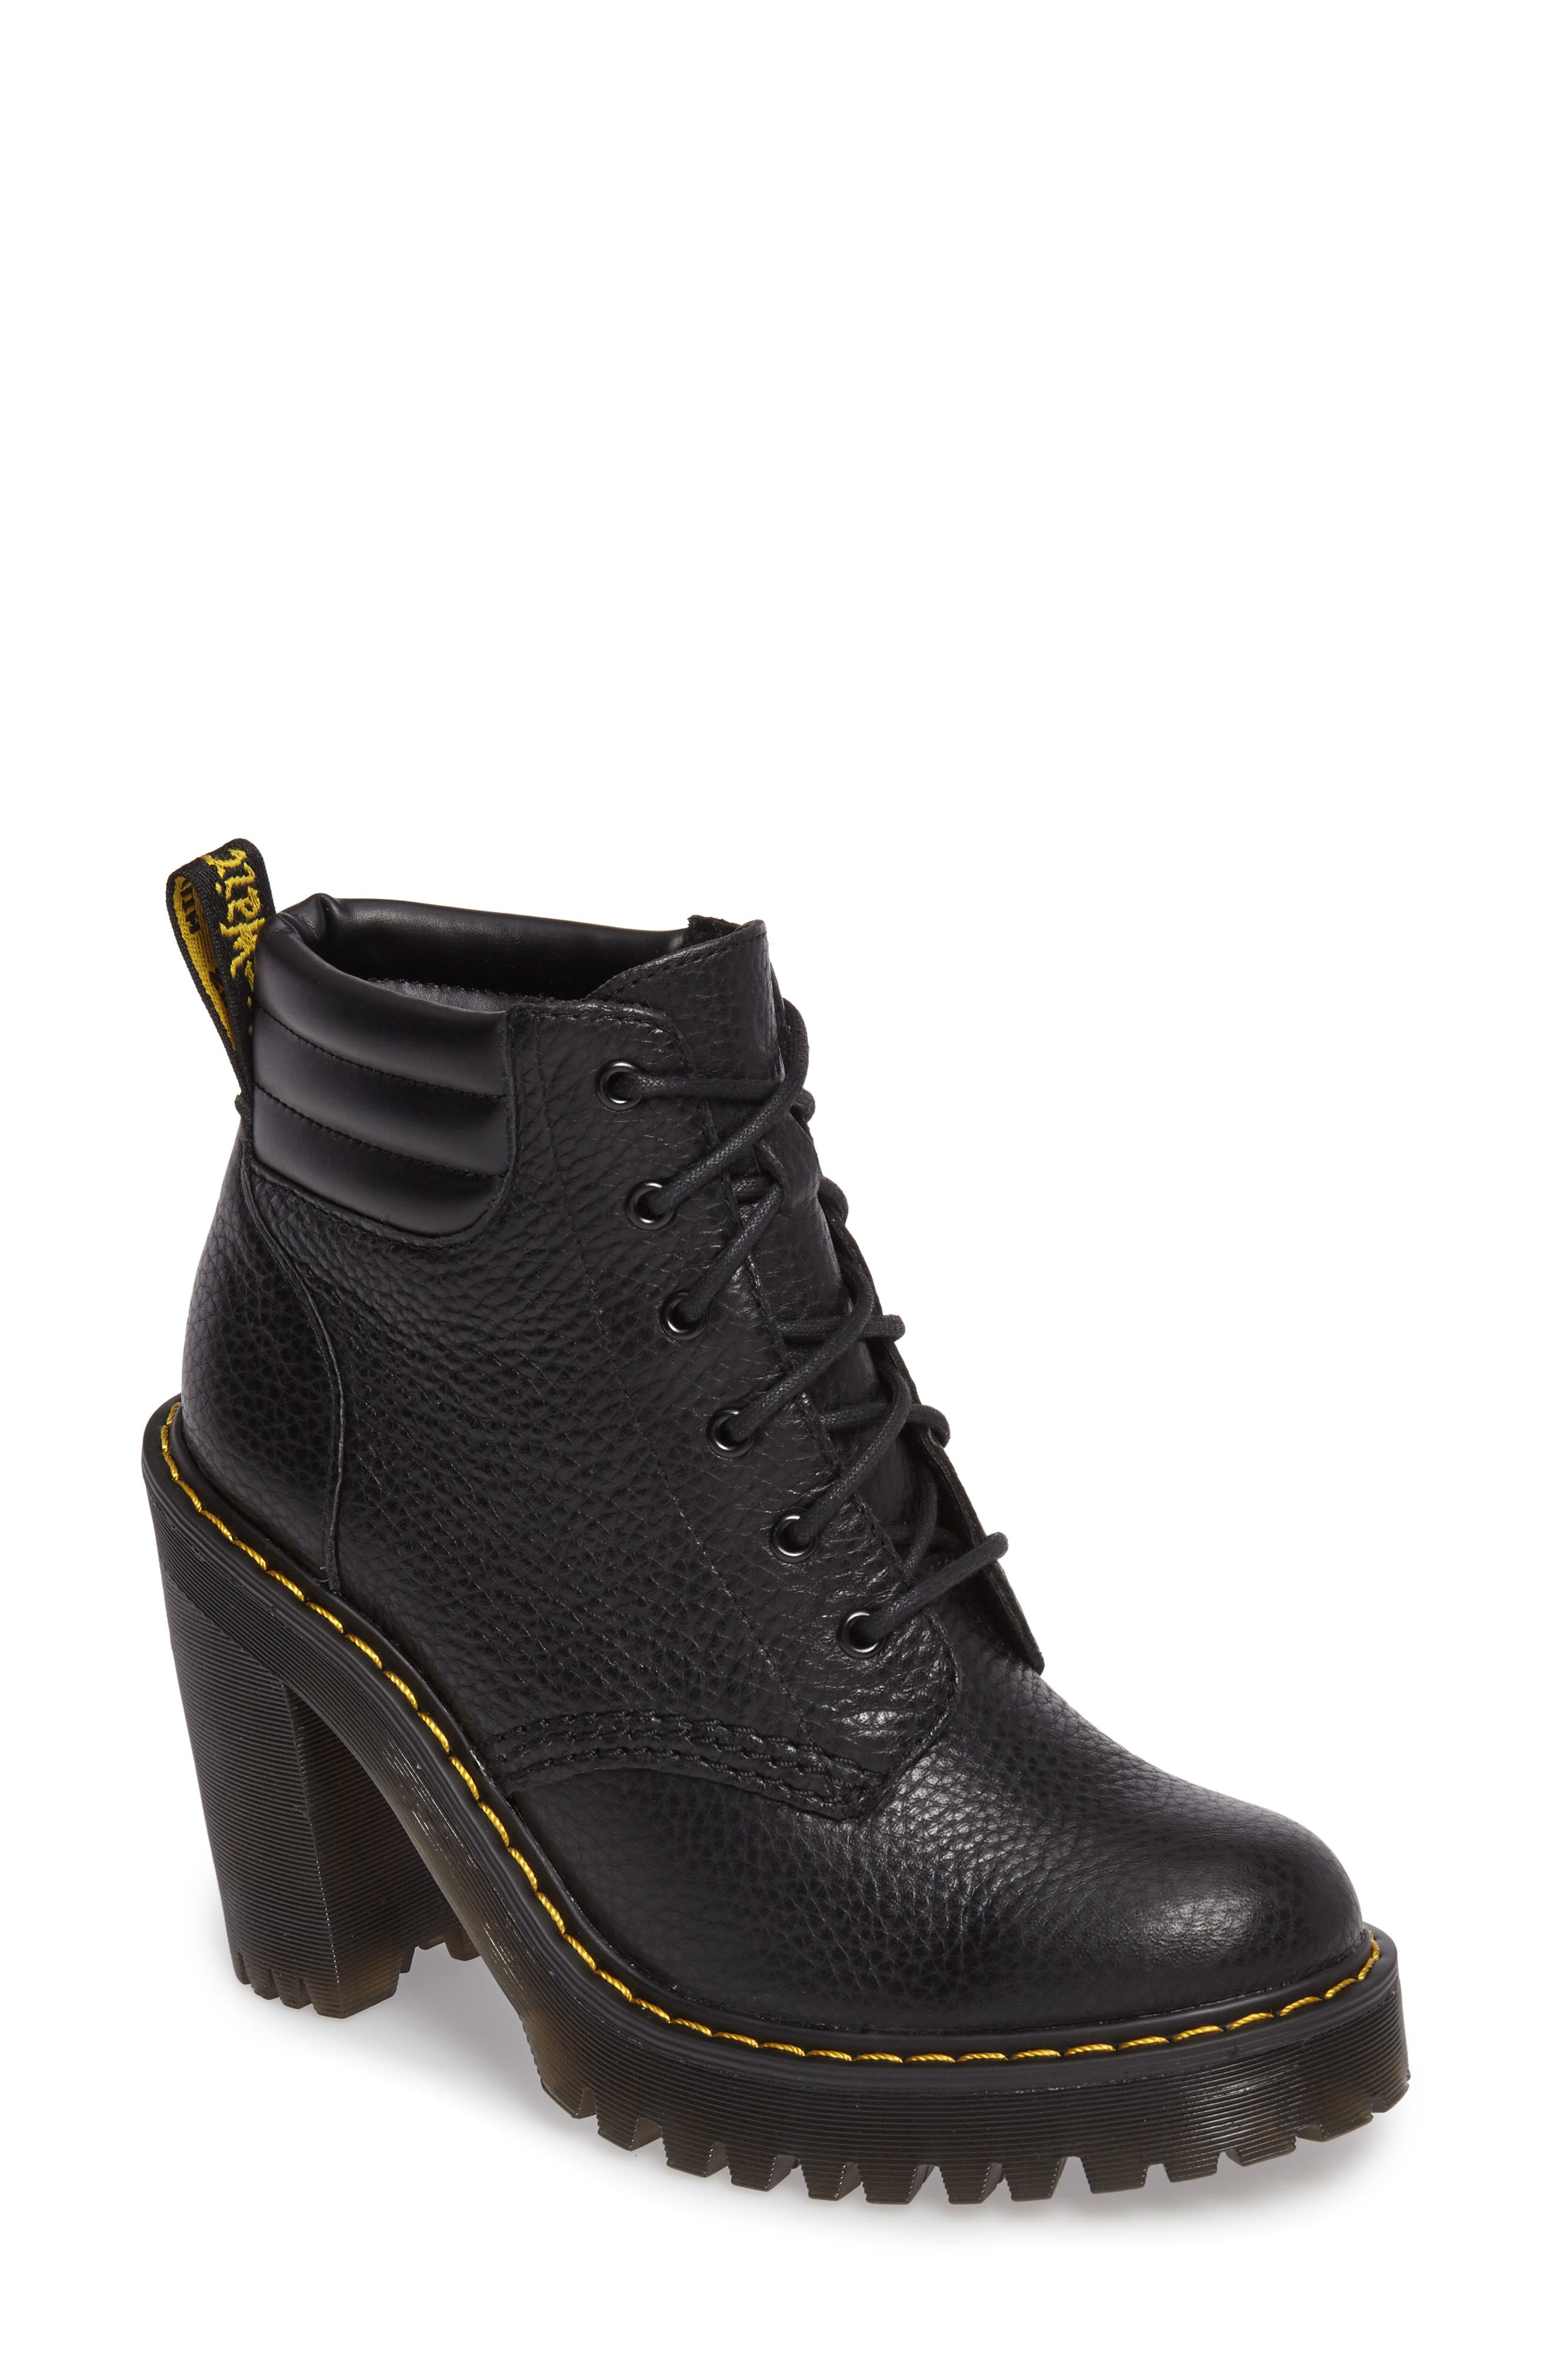 Persephone Platform Boot,                         Main,                         color, Black Leather